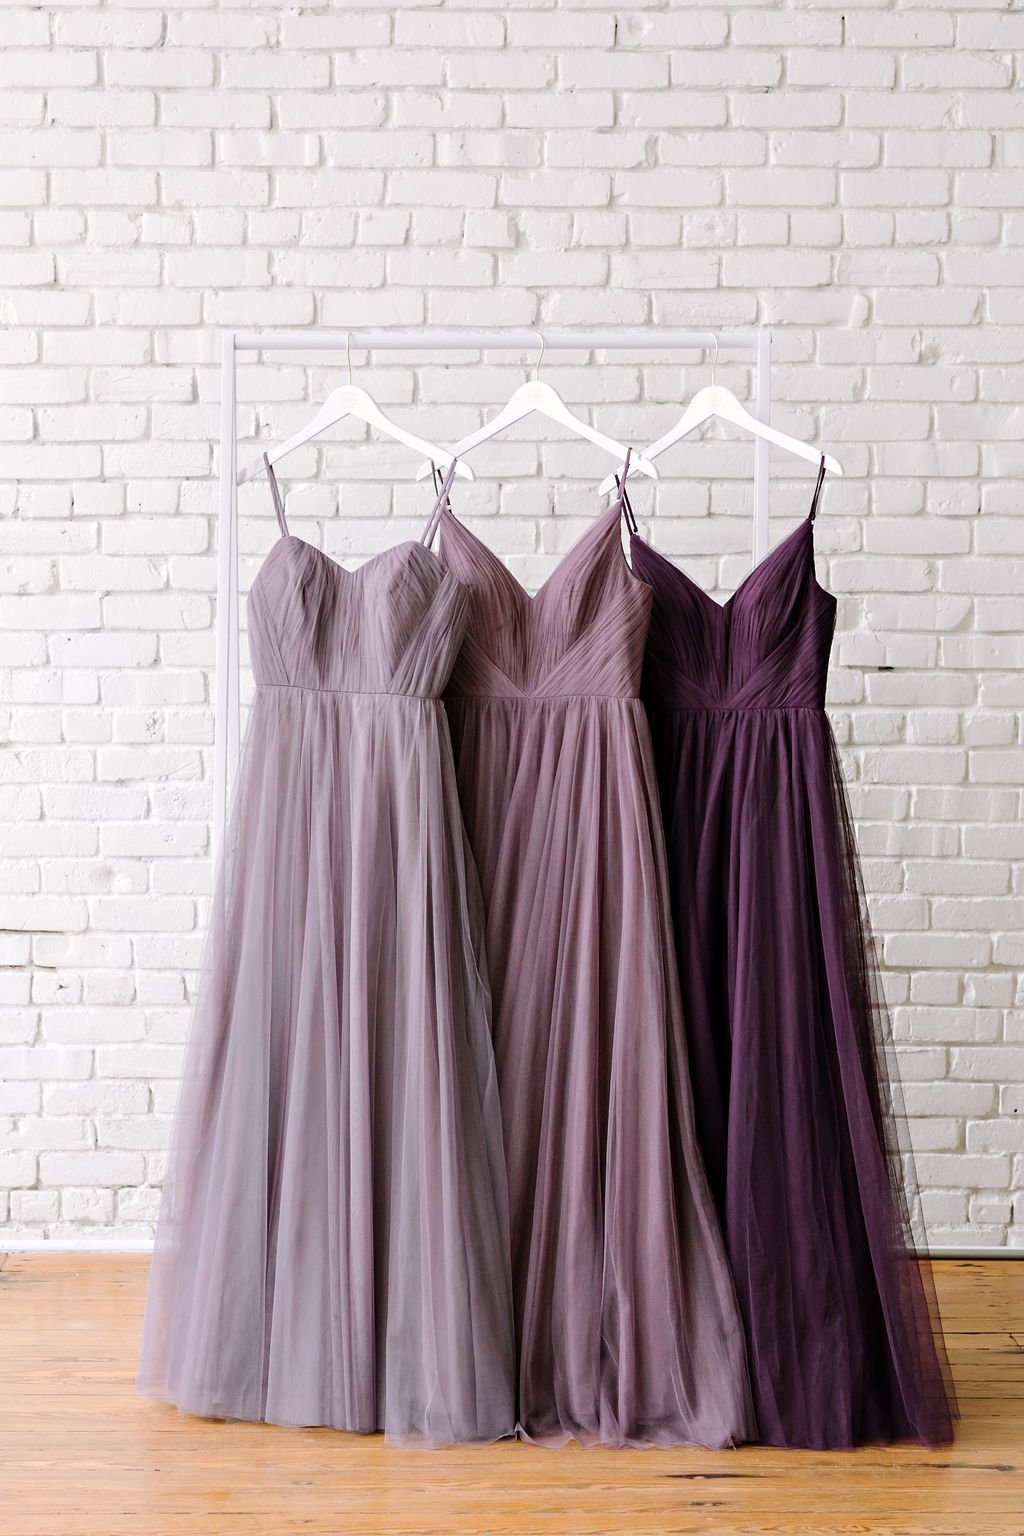 Left To Right In Tulle Wisteria Dusty Purple Velvet Plum If The Full Purple E Dusty Purple Bridesmaid Dresses Grey Purple Wedding Purple Bridesmaid Dresses [ 1536 x 1024 Pixel ]